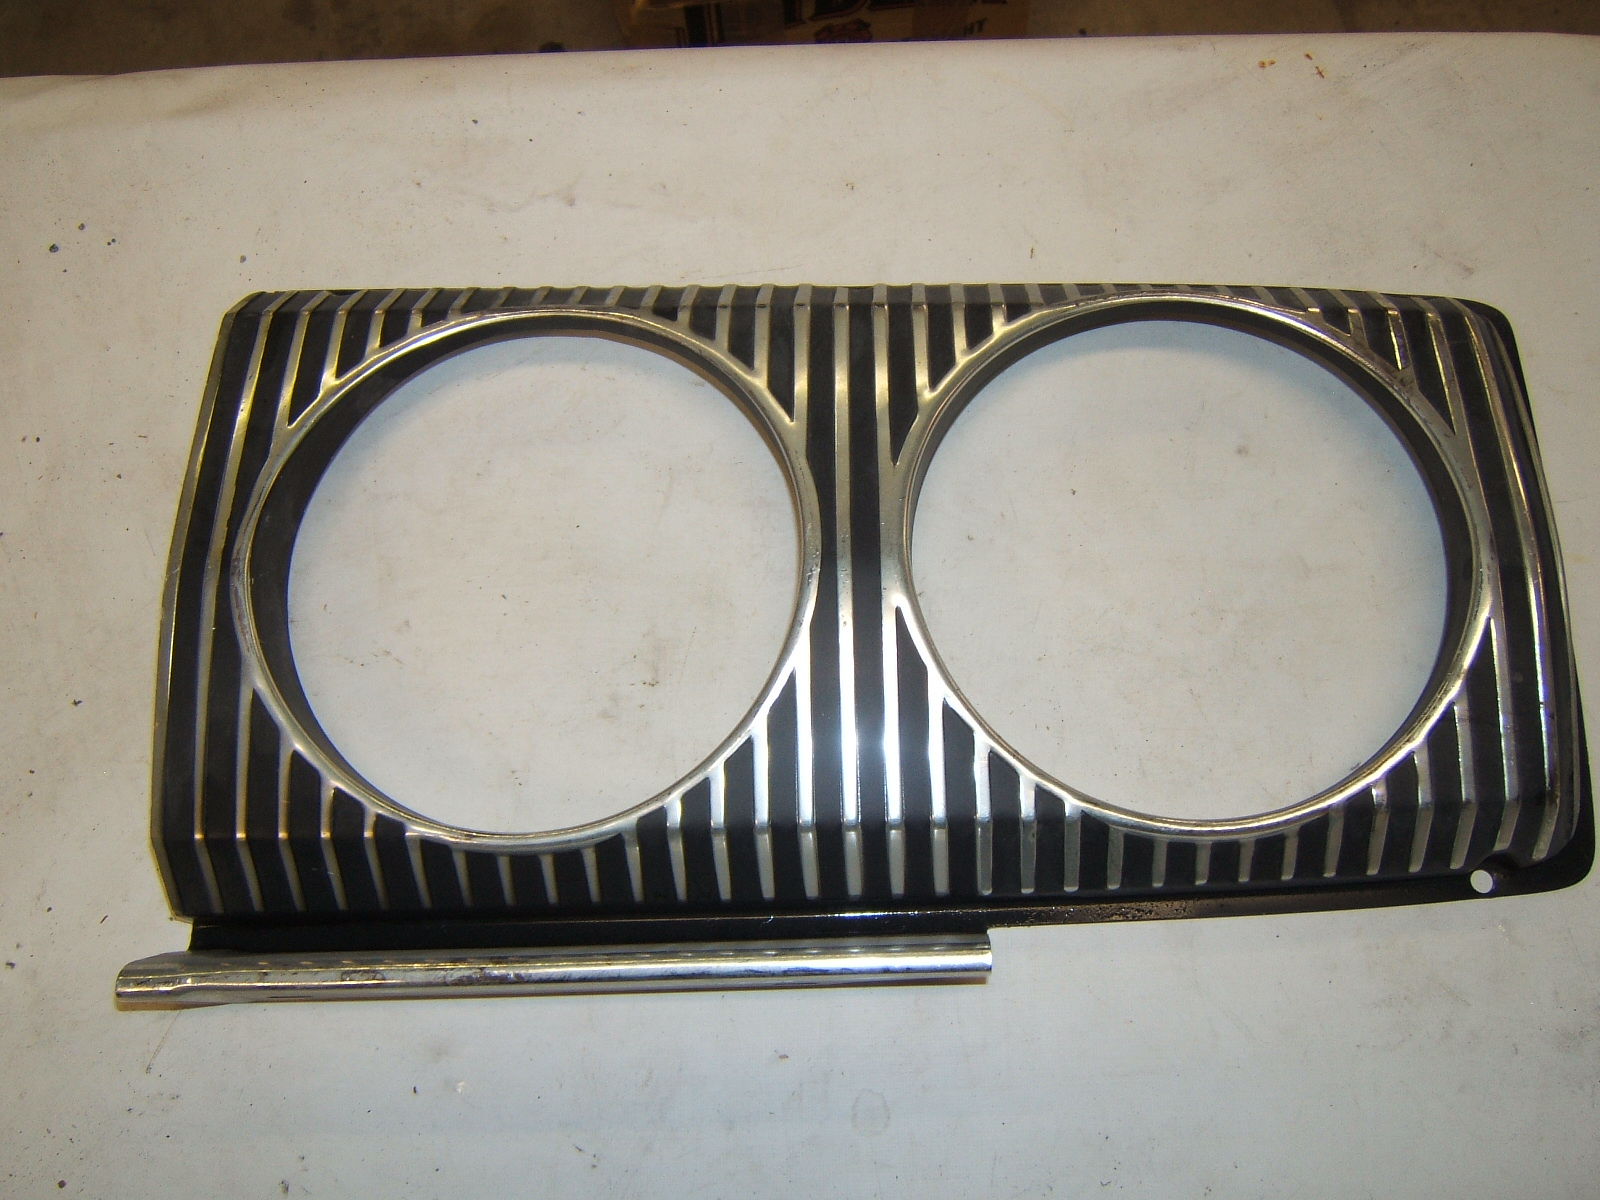 1967 Dodge Coronet NOS right Headlight Bezel 2582310 NOS (a 2582310)